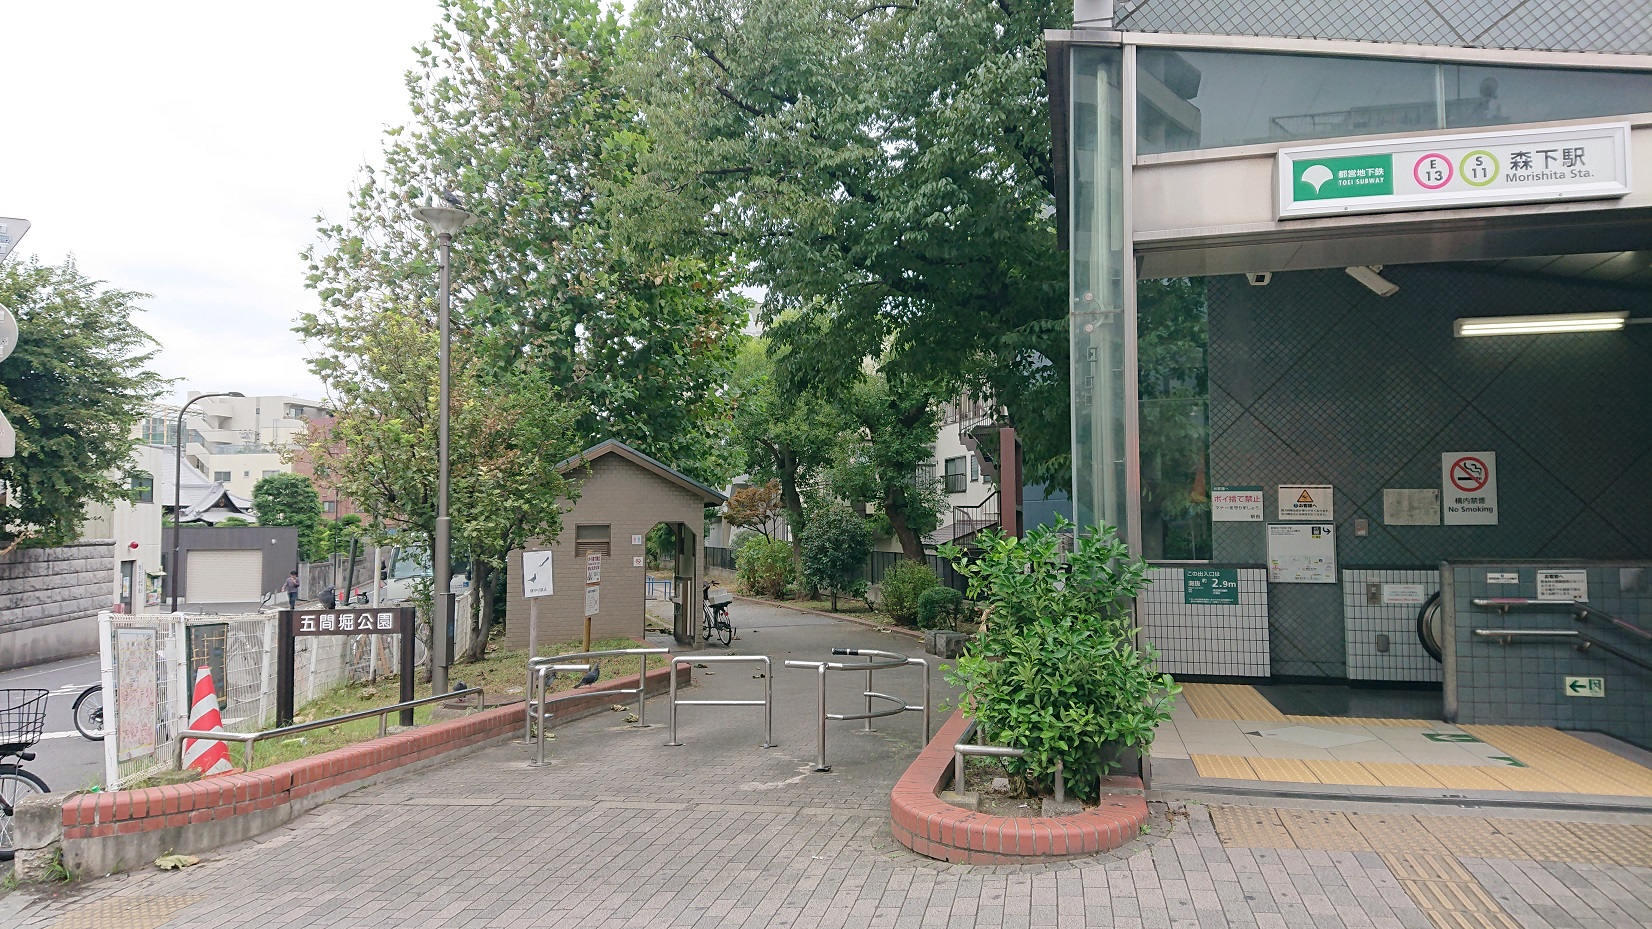 五間堀公園と森下駅